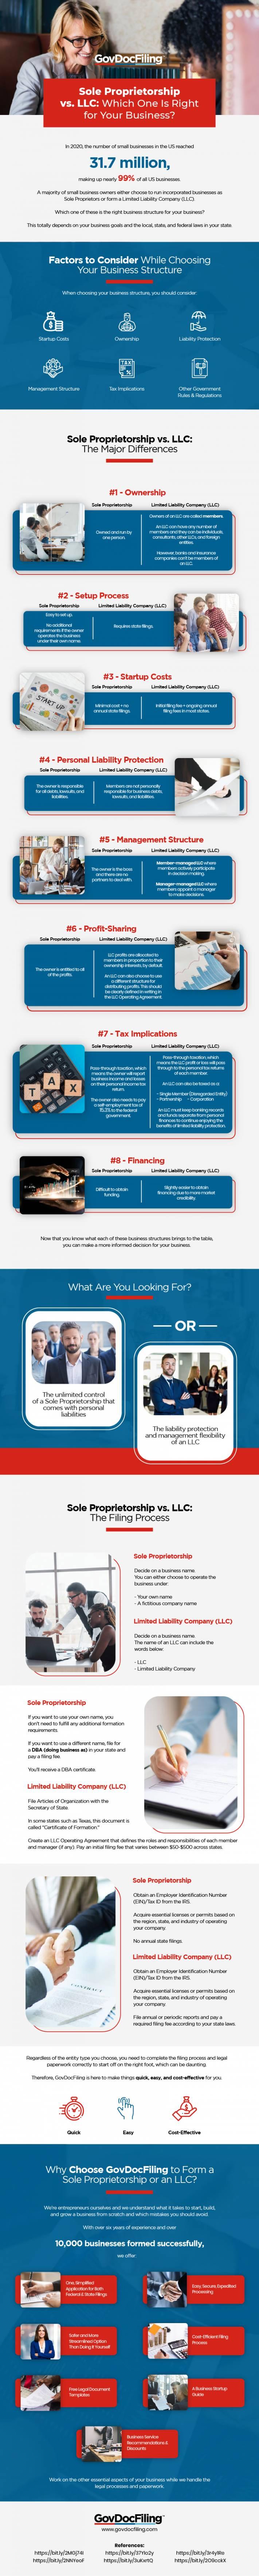 Sole Proprietorship vs LLC Infographic